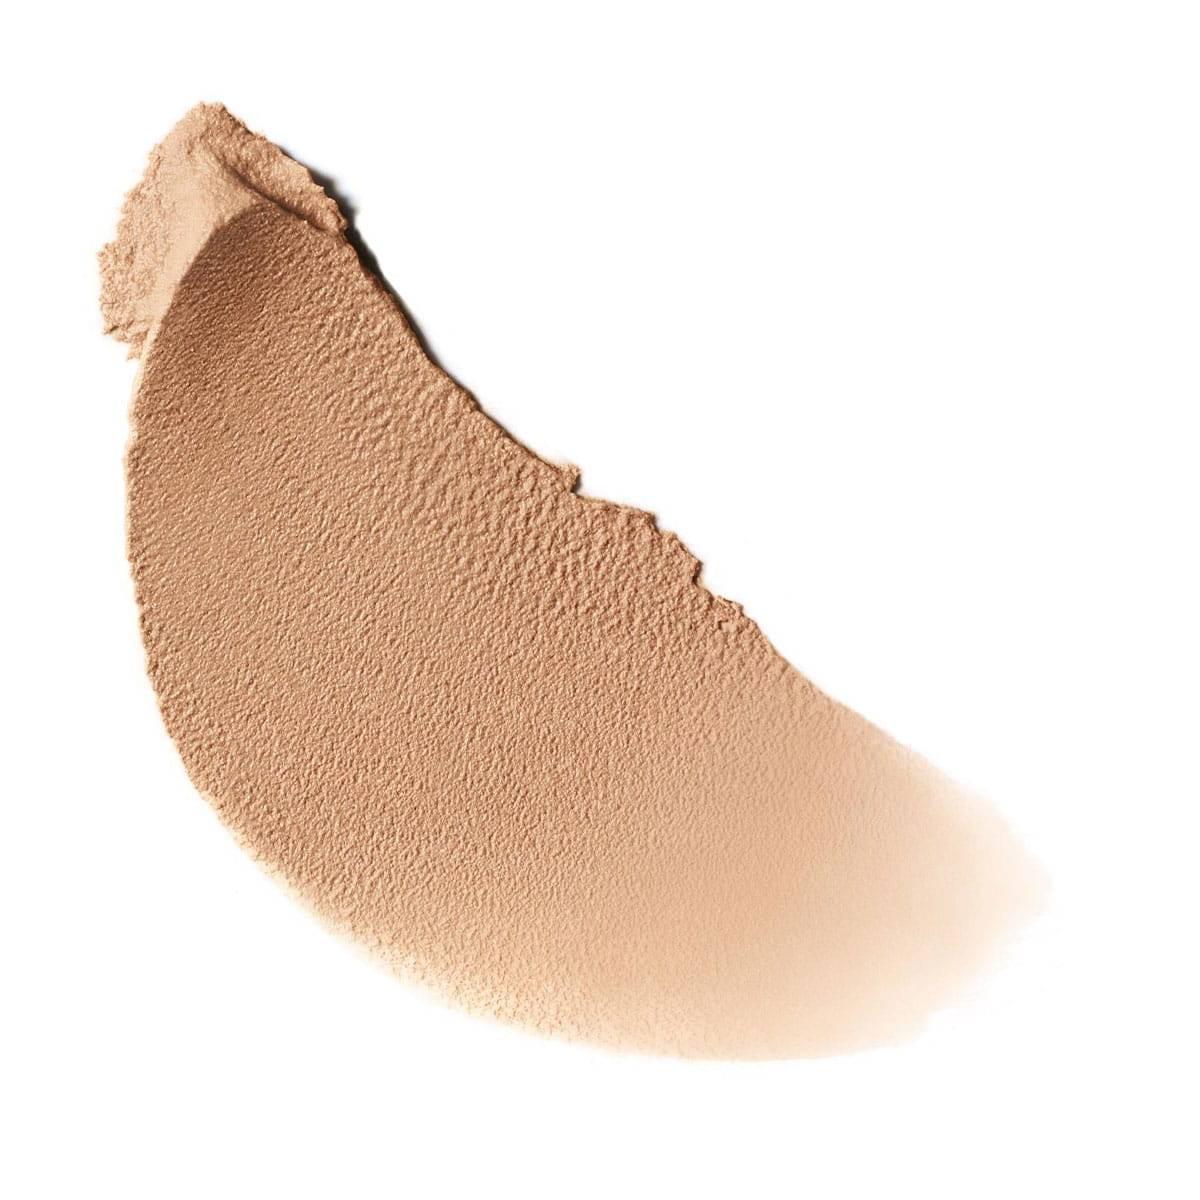 La Roche Posay Sensitive Toleriane Make up MOUSSE_FOUNDATION_03SANDBEI